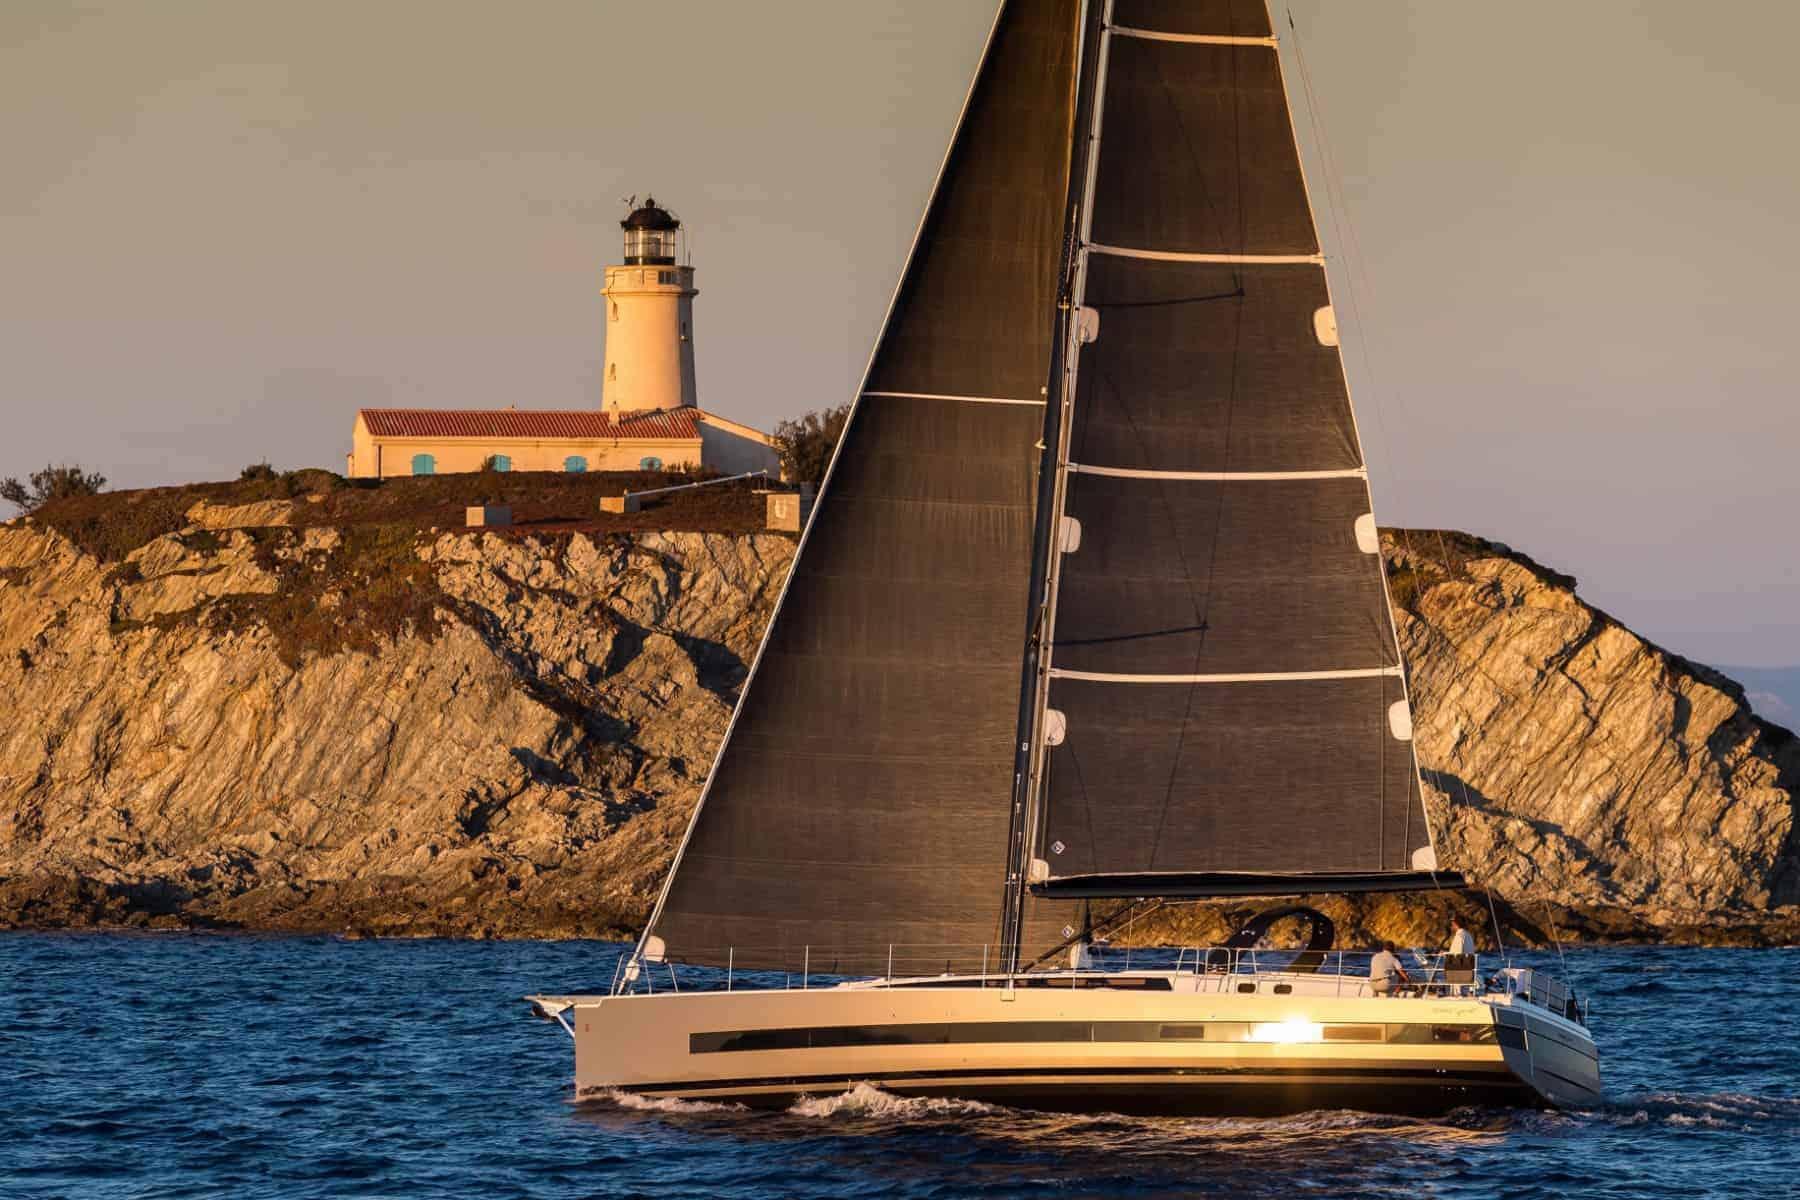 The Beneteau Oceanis Yacht 62 crusing along side beautiful coastline